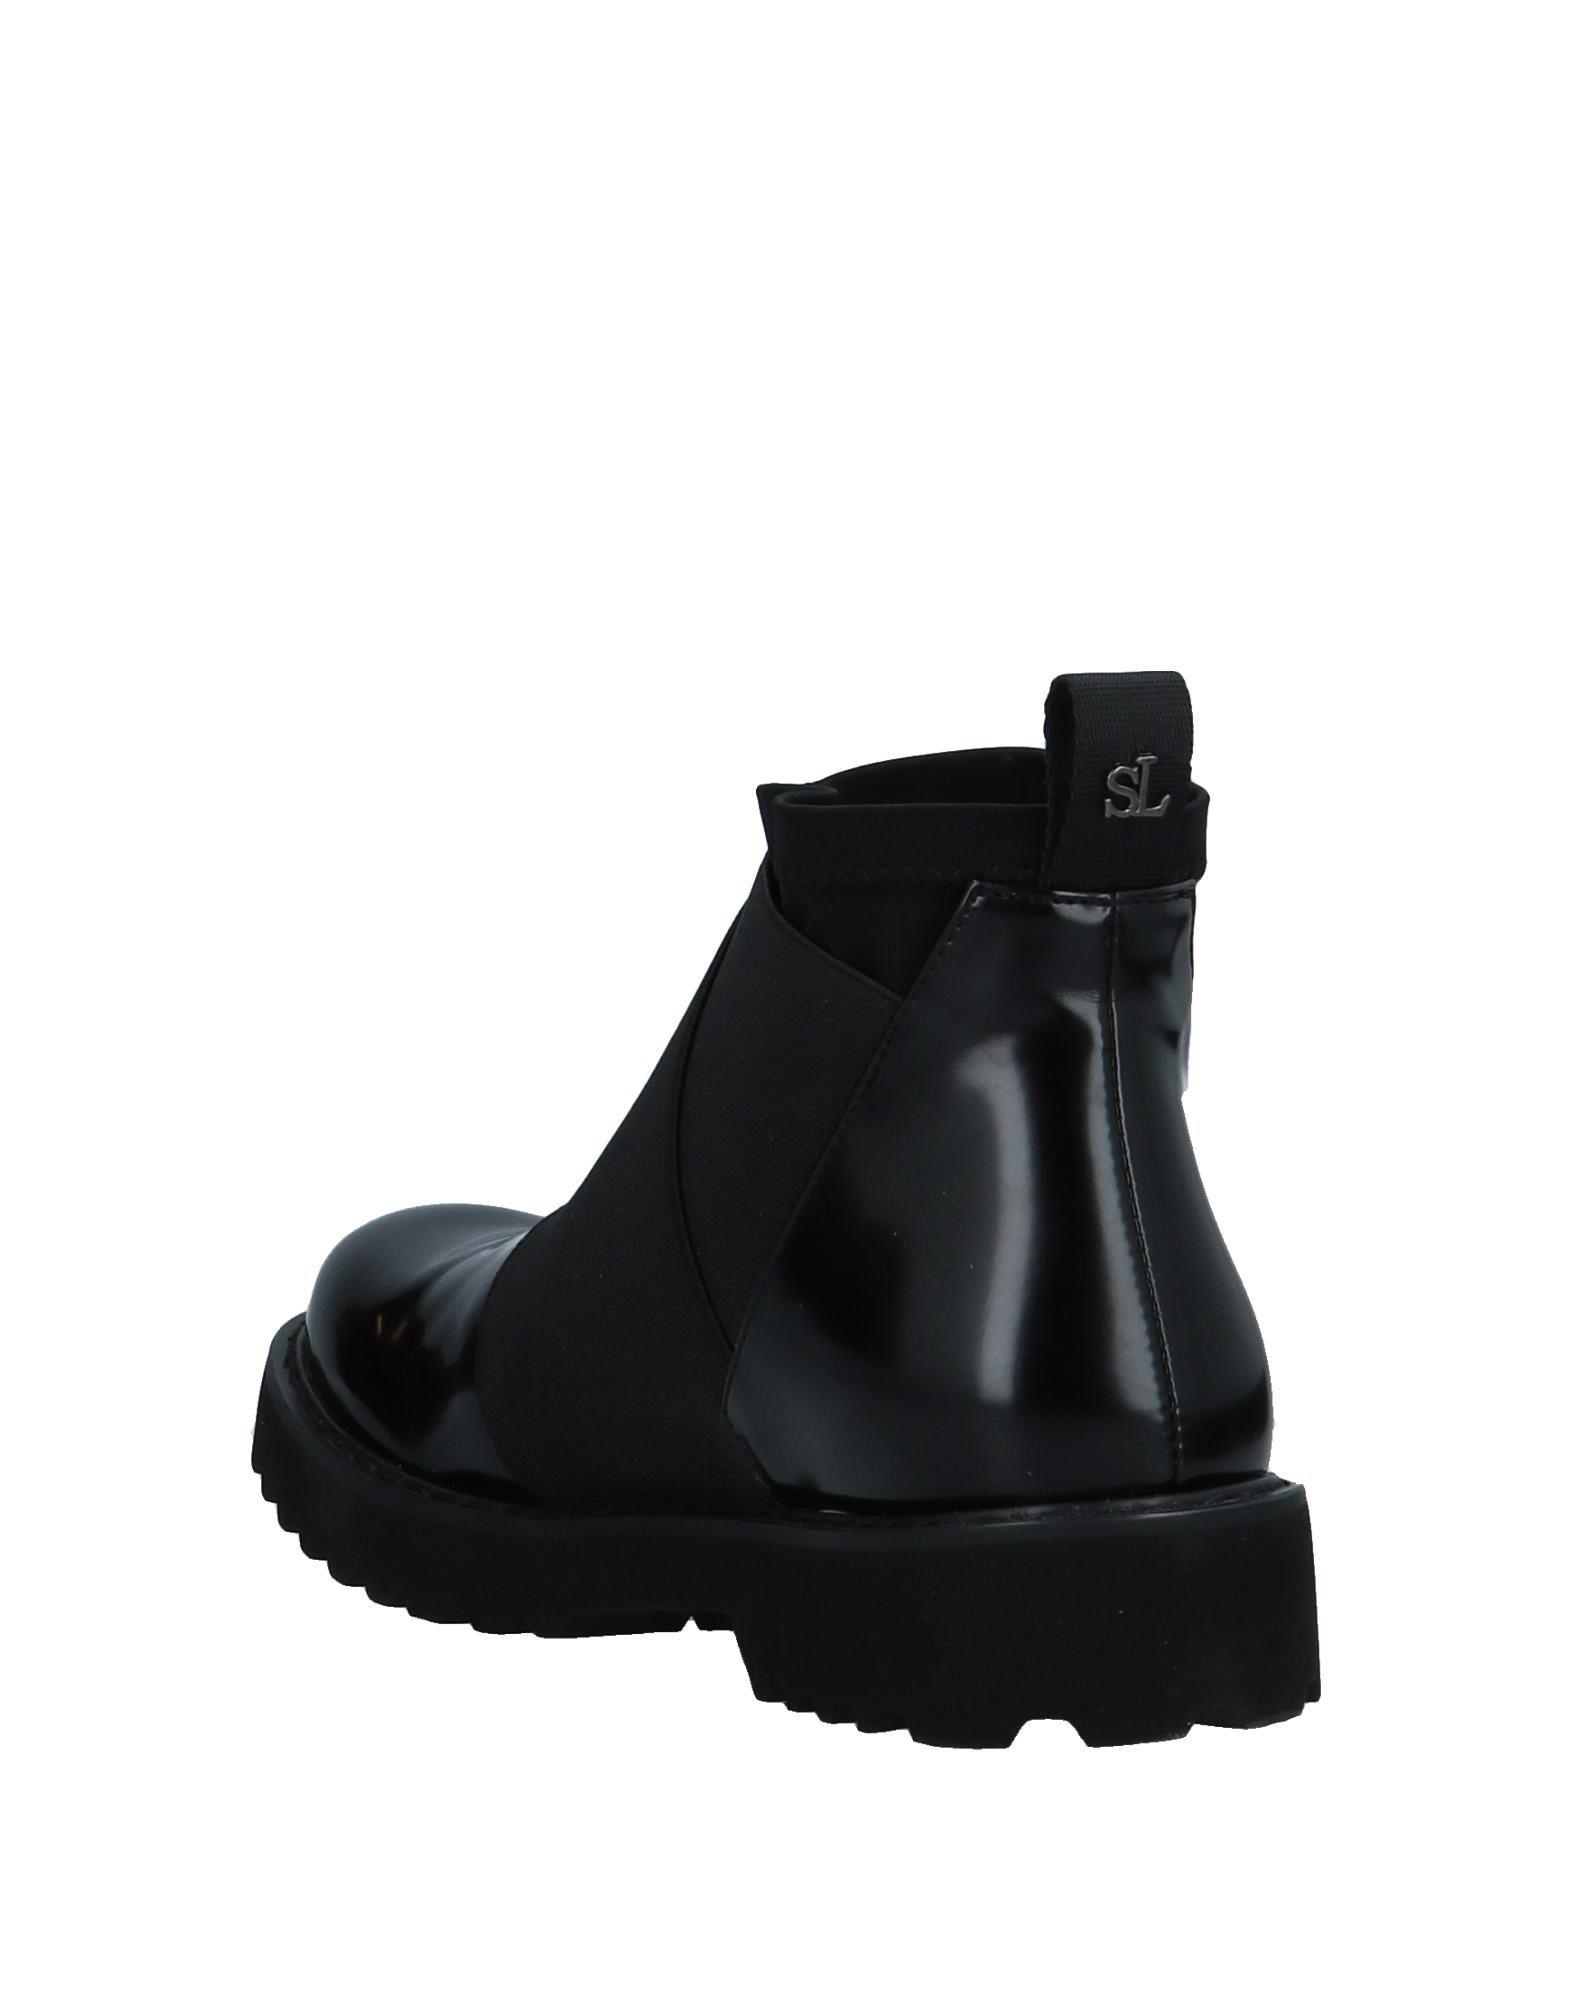 Sara 11537502PD López Stiefelette Damen  11537502PD Sara Gute Qualität beliebte Schuhe 3a27ca